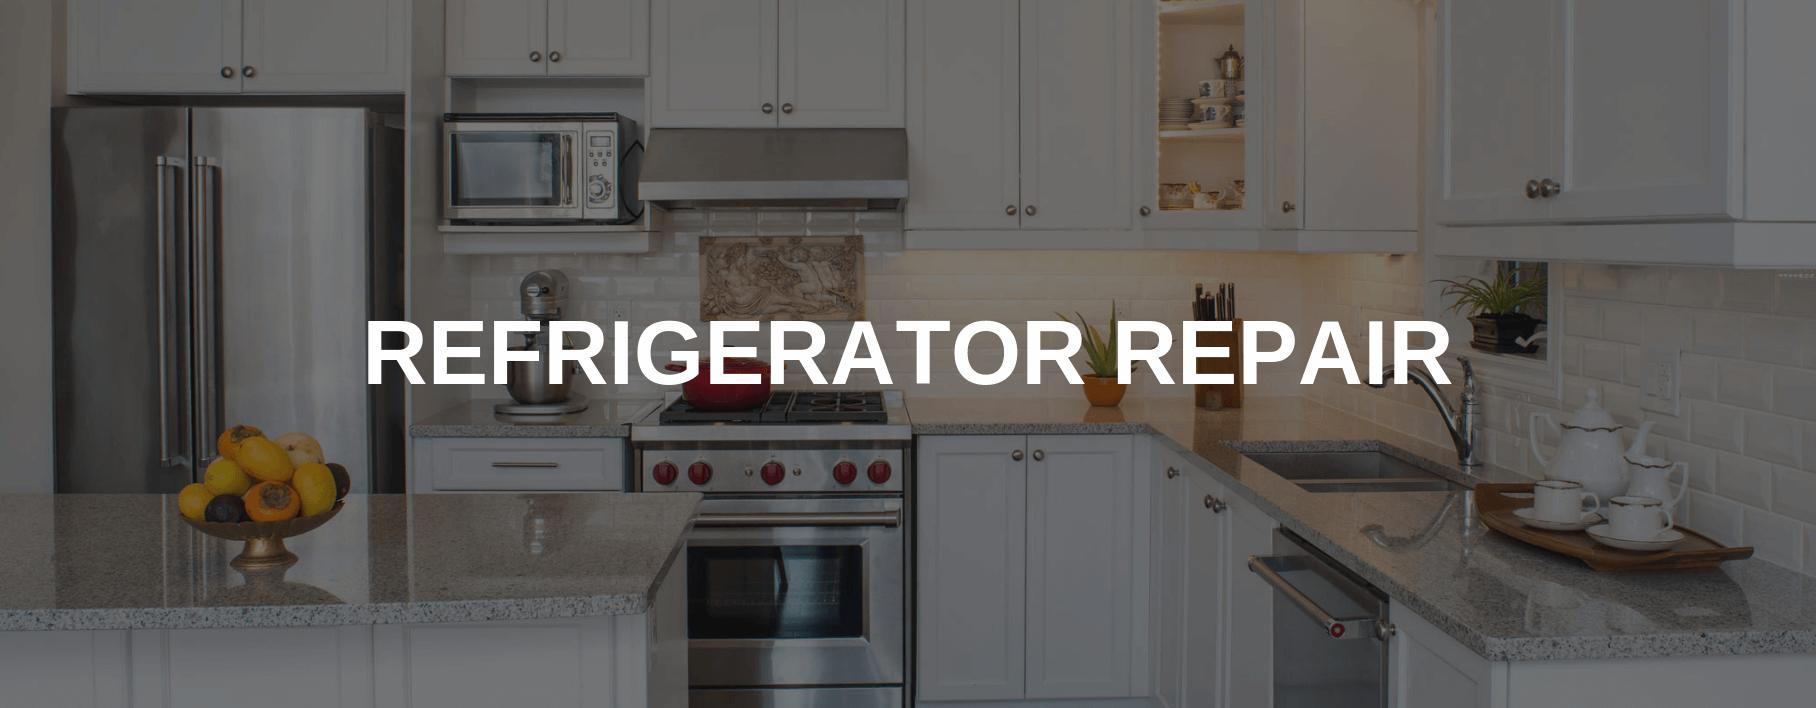 refrigerator repair middletown